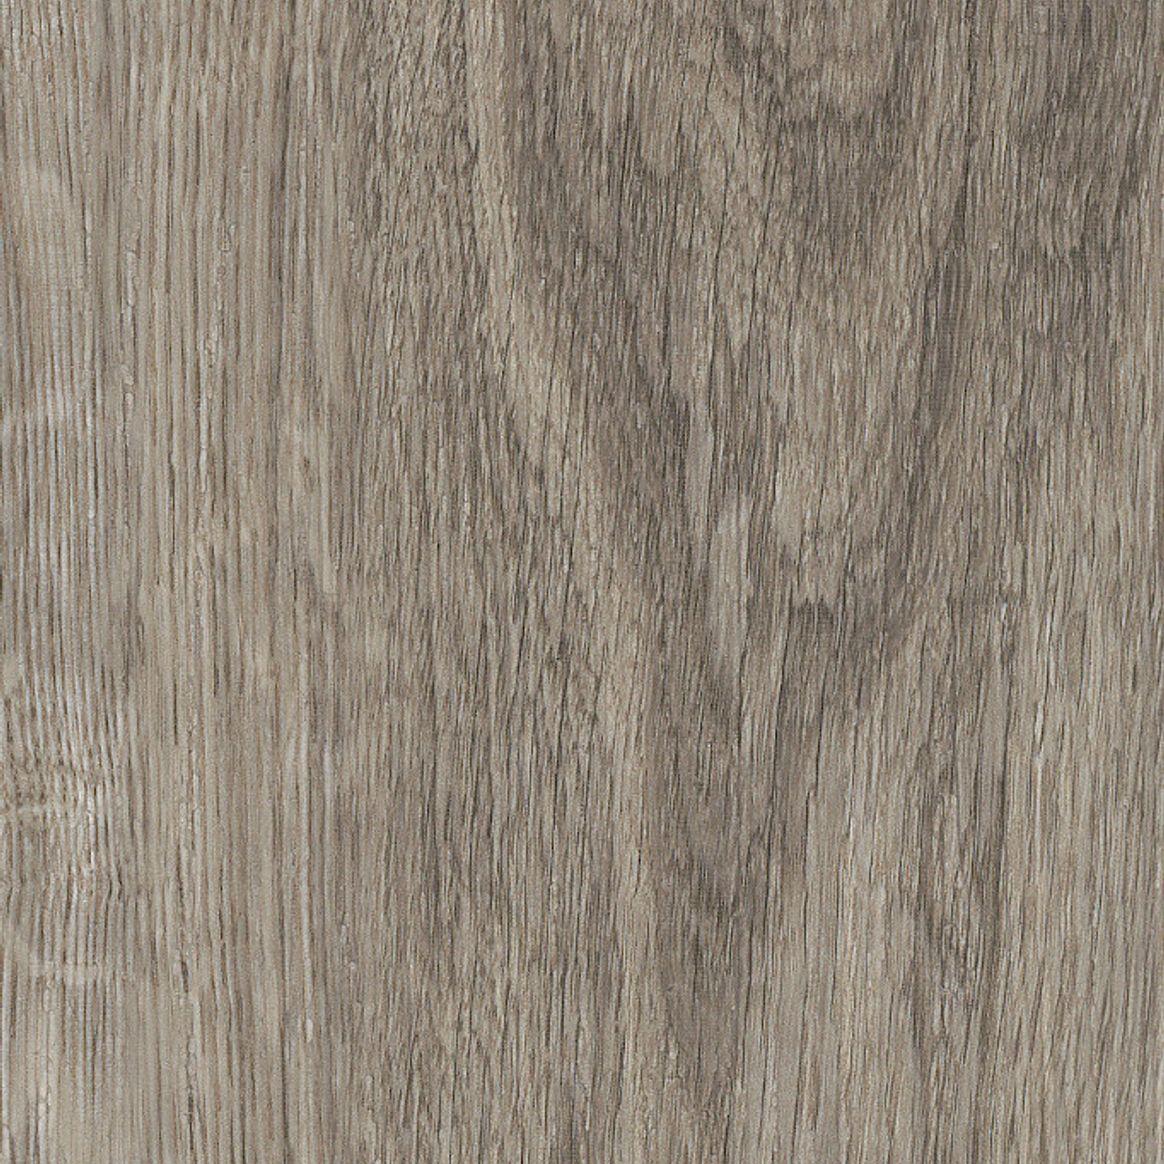 Weathered Oak tile